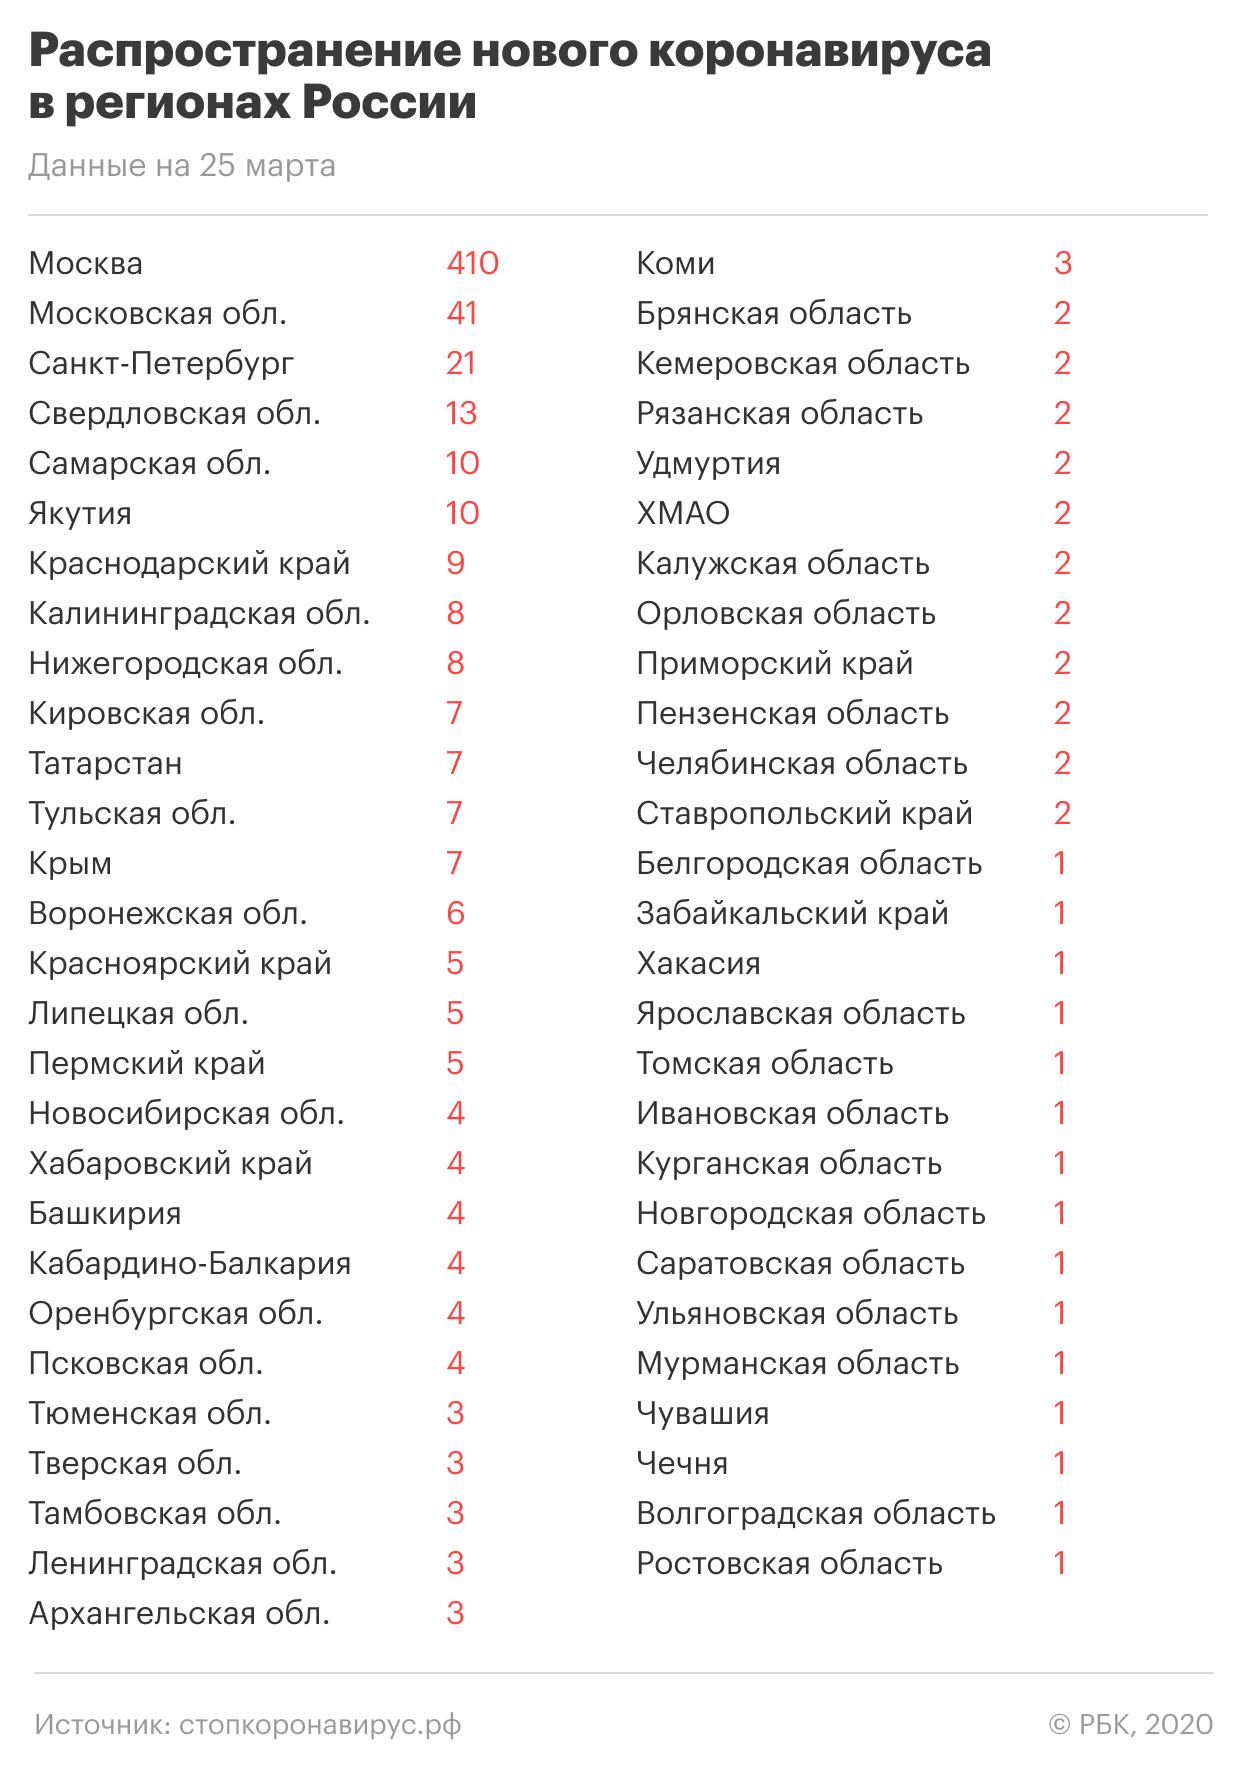 https://s0.rbk.ru/v6_top_pics/media/img/1/87/755851354620871.png